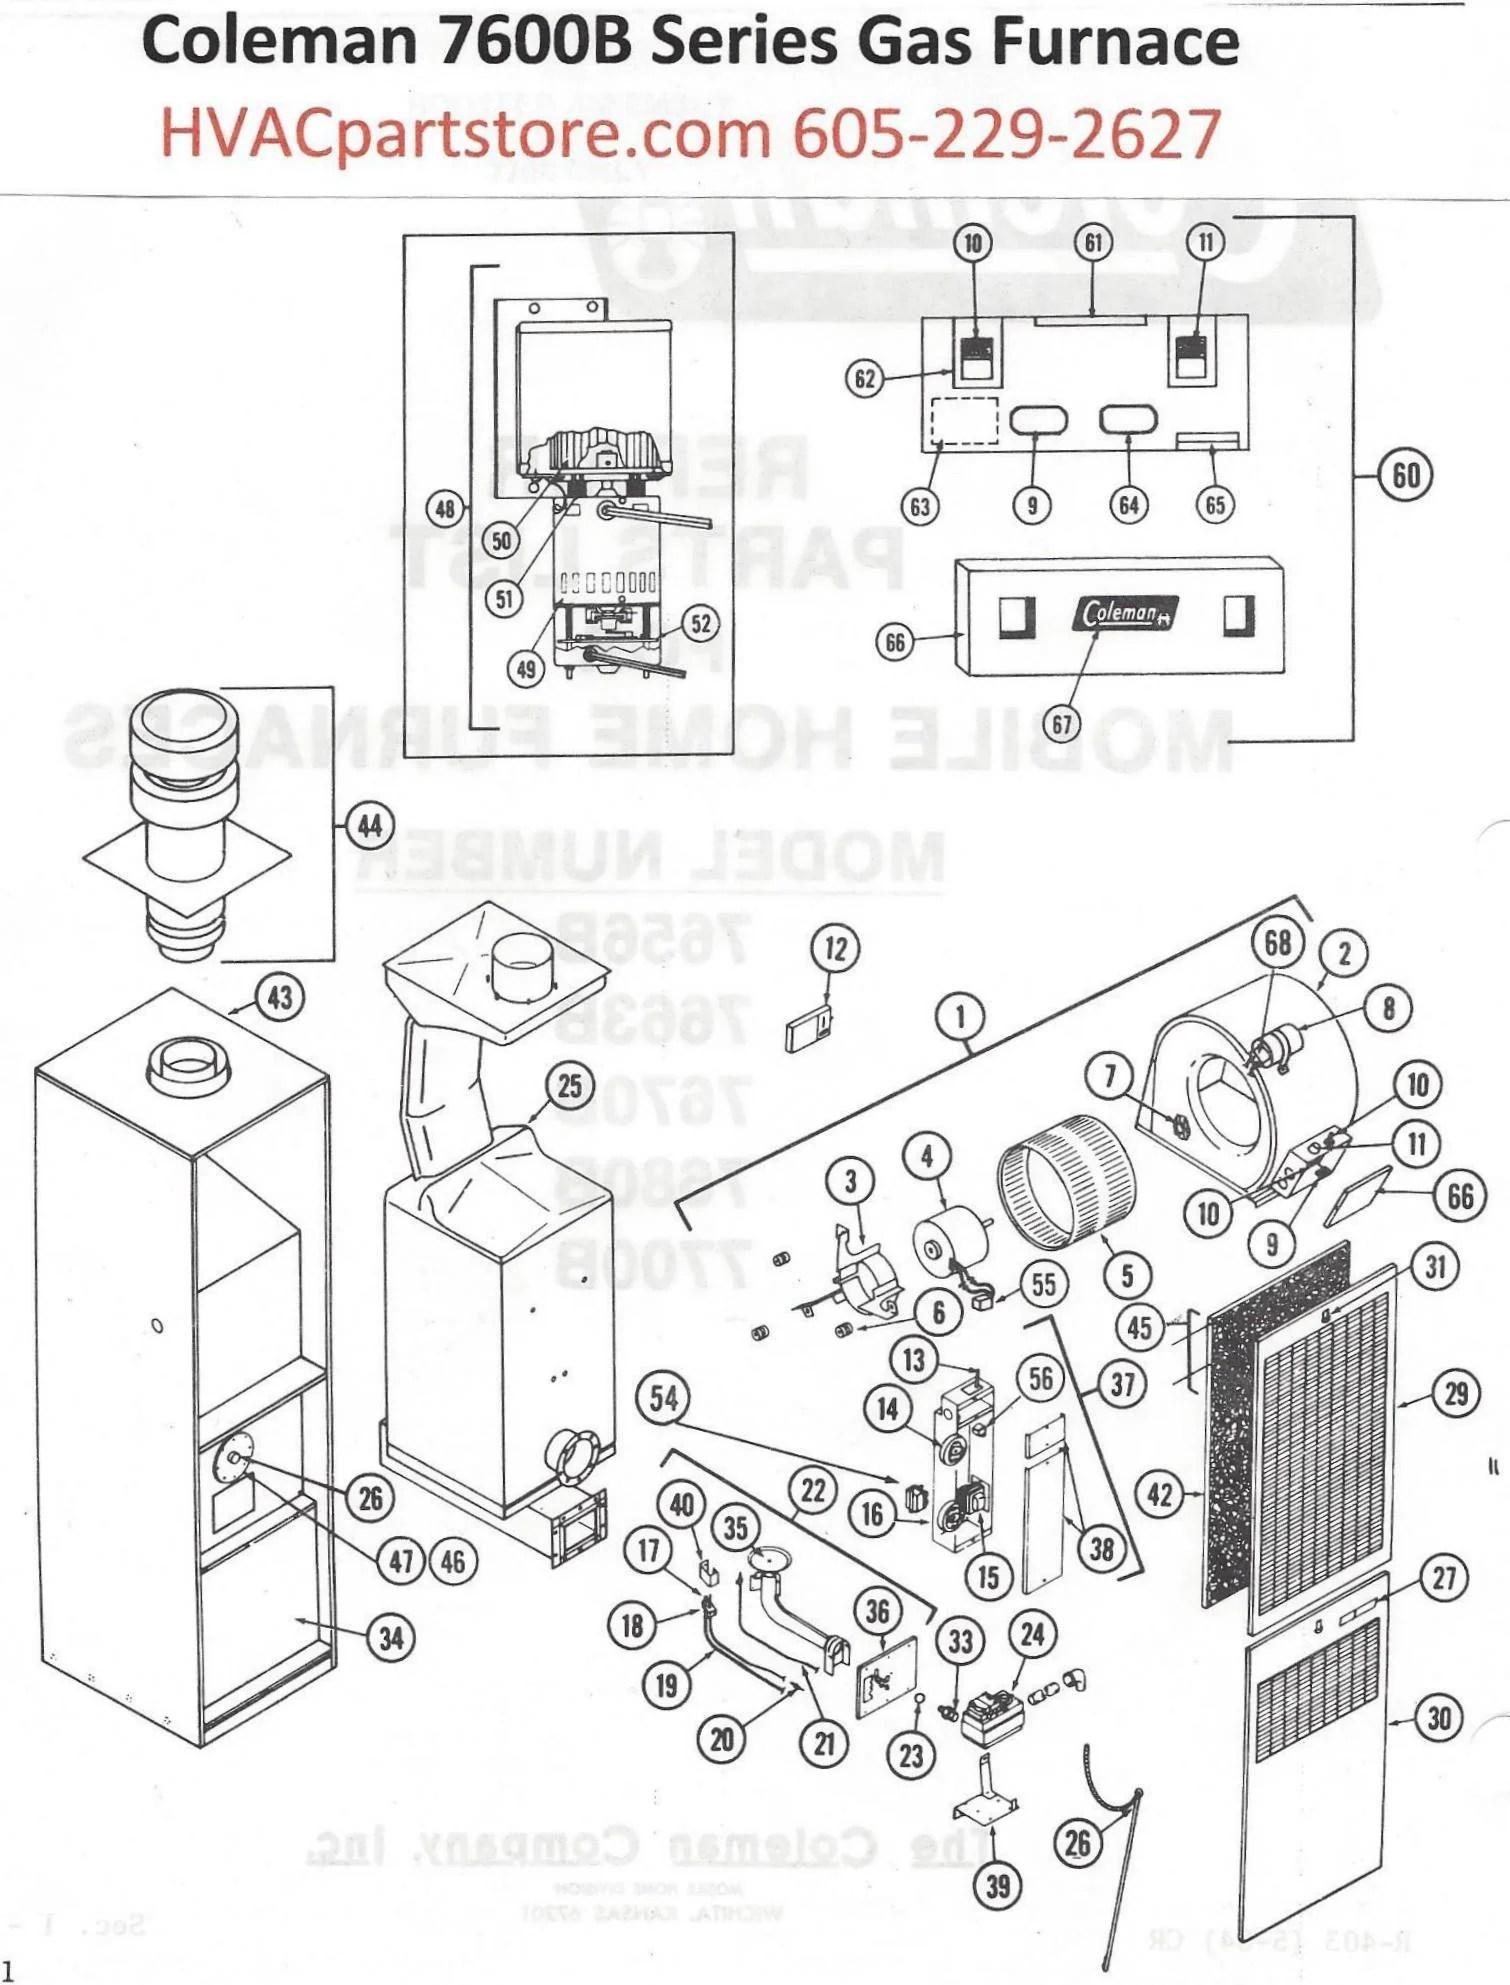 7680B856 Coleman Gas Furnace Parts – HVACpartstore